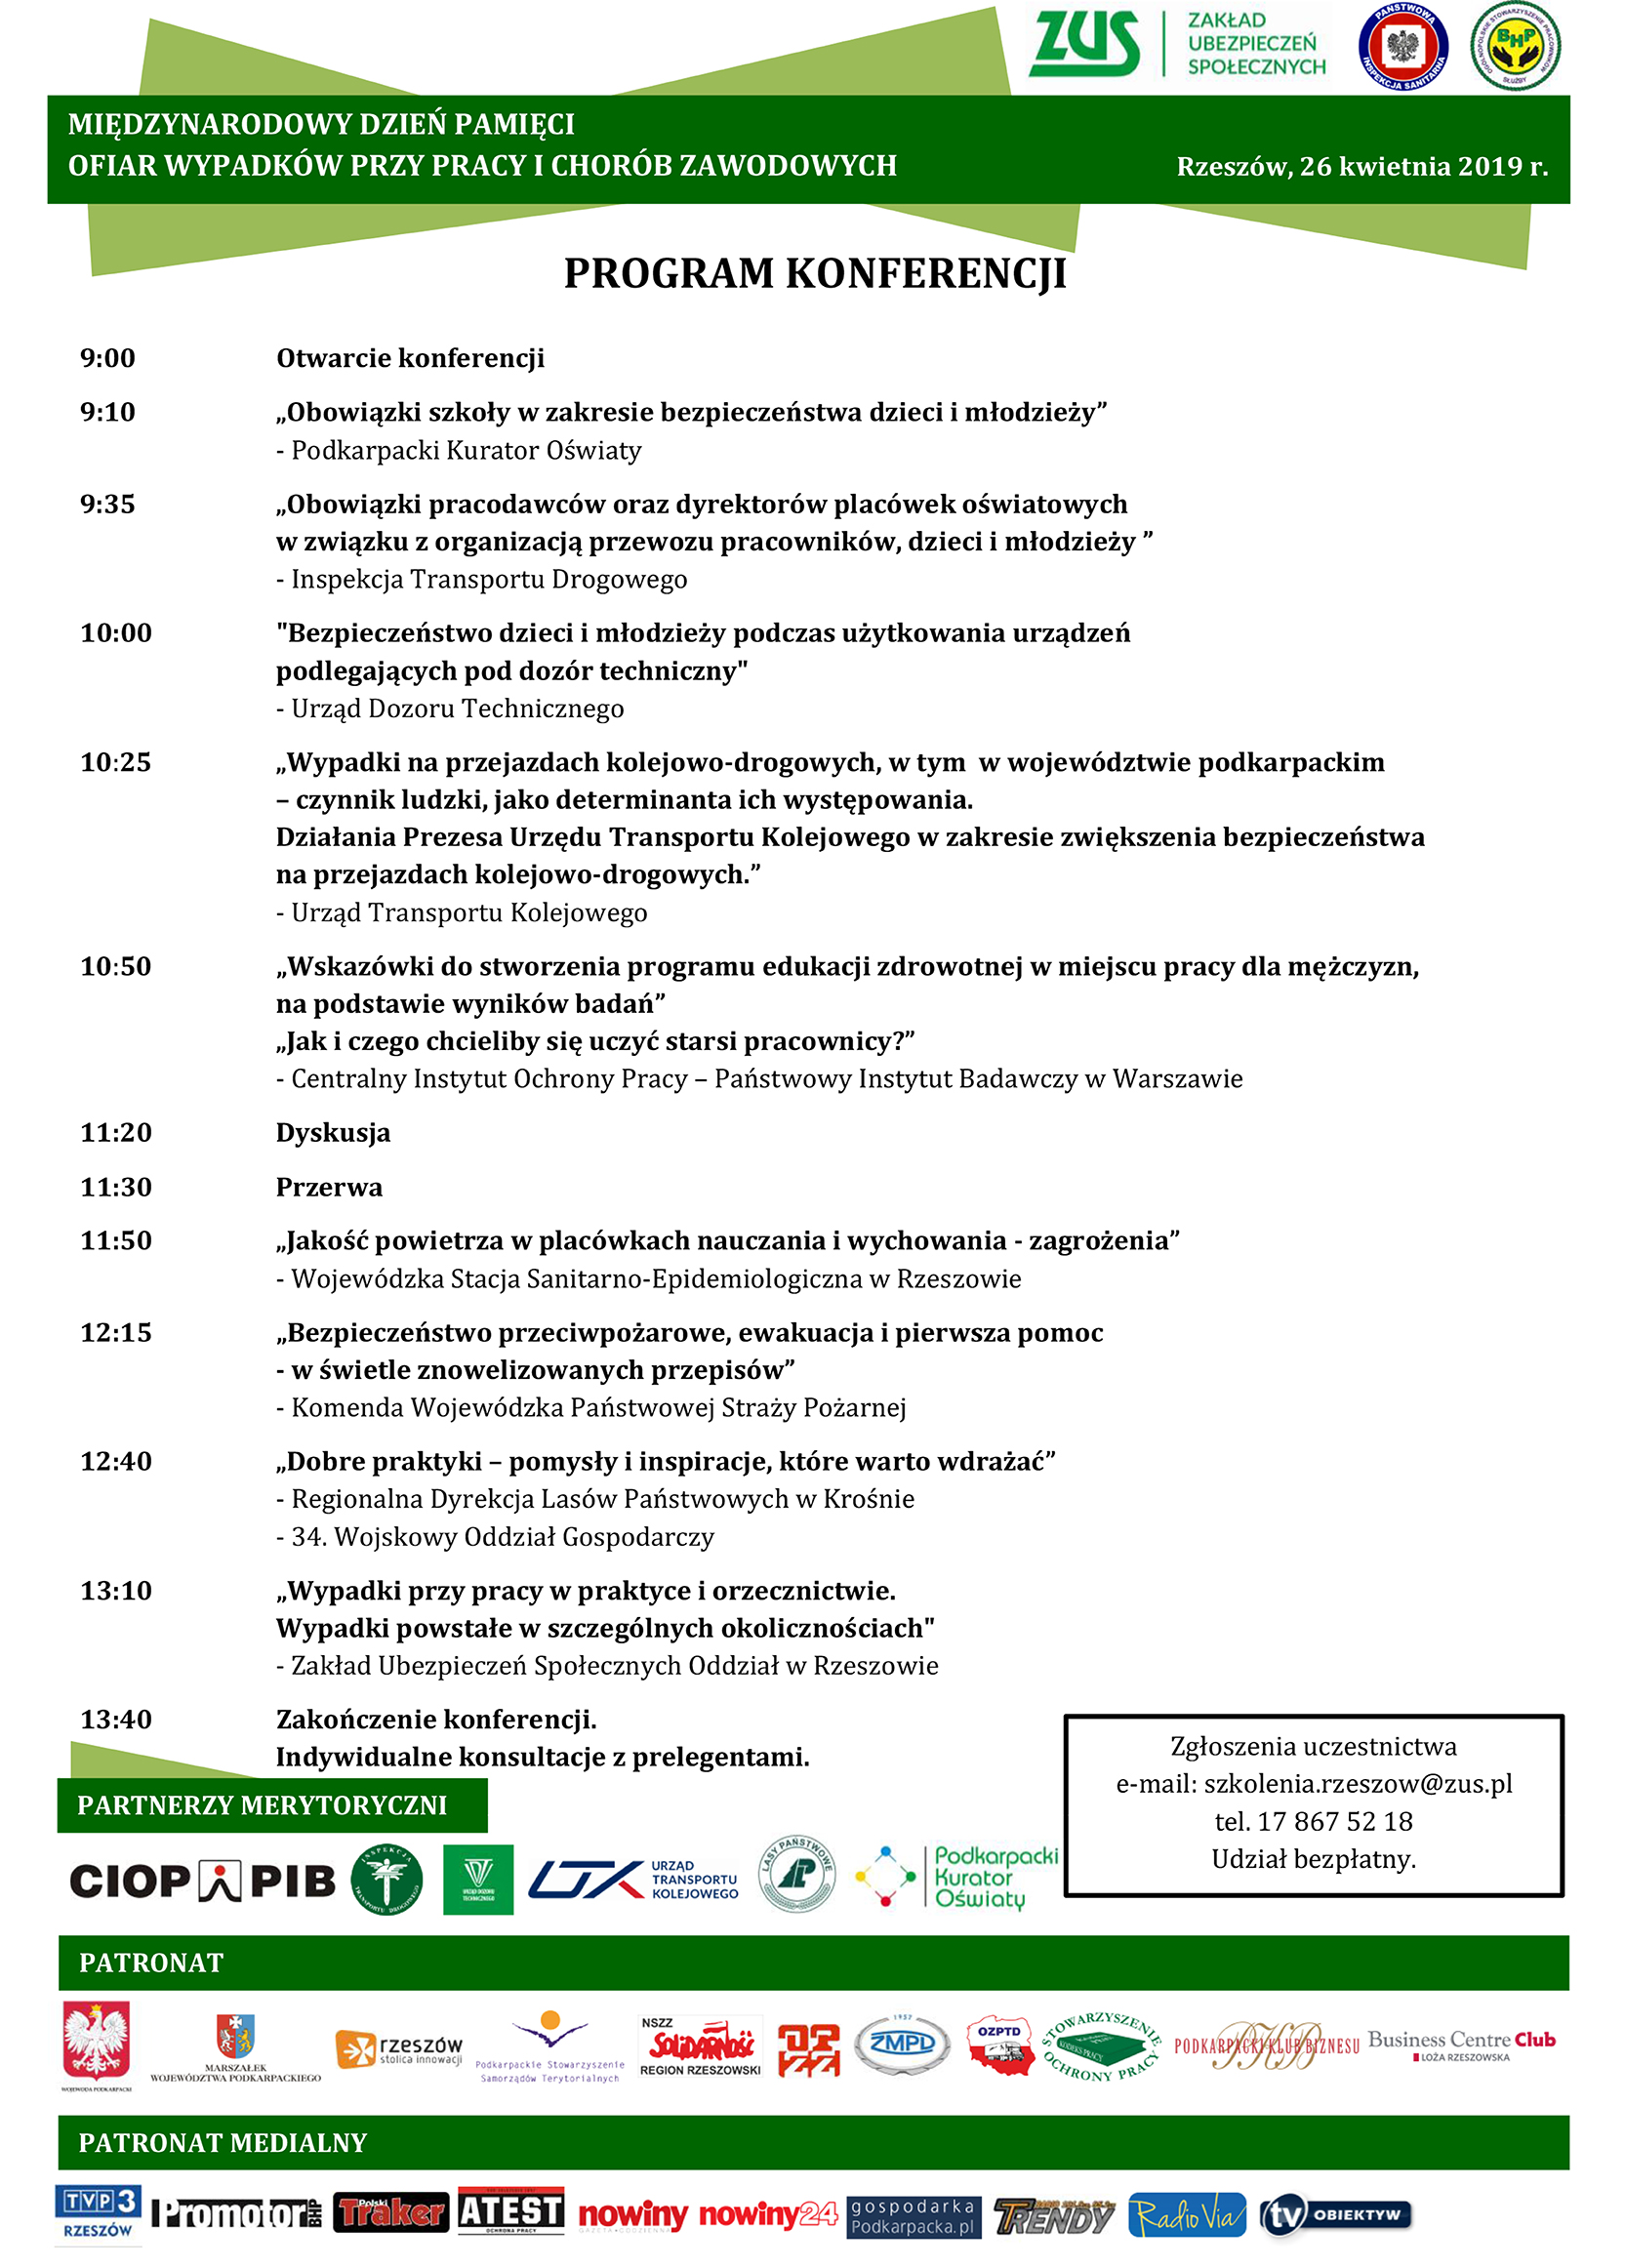 Program Konferencji 26.04